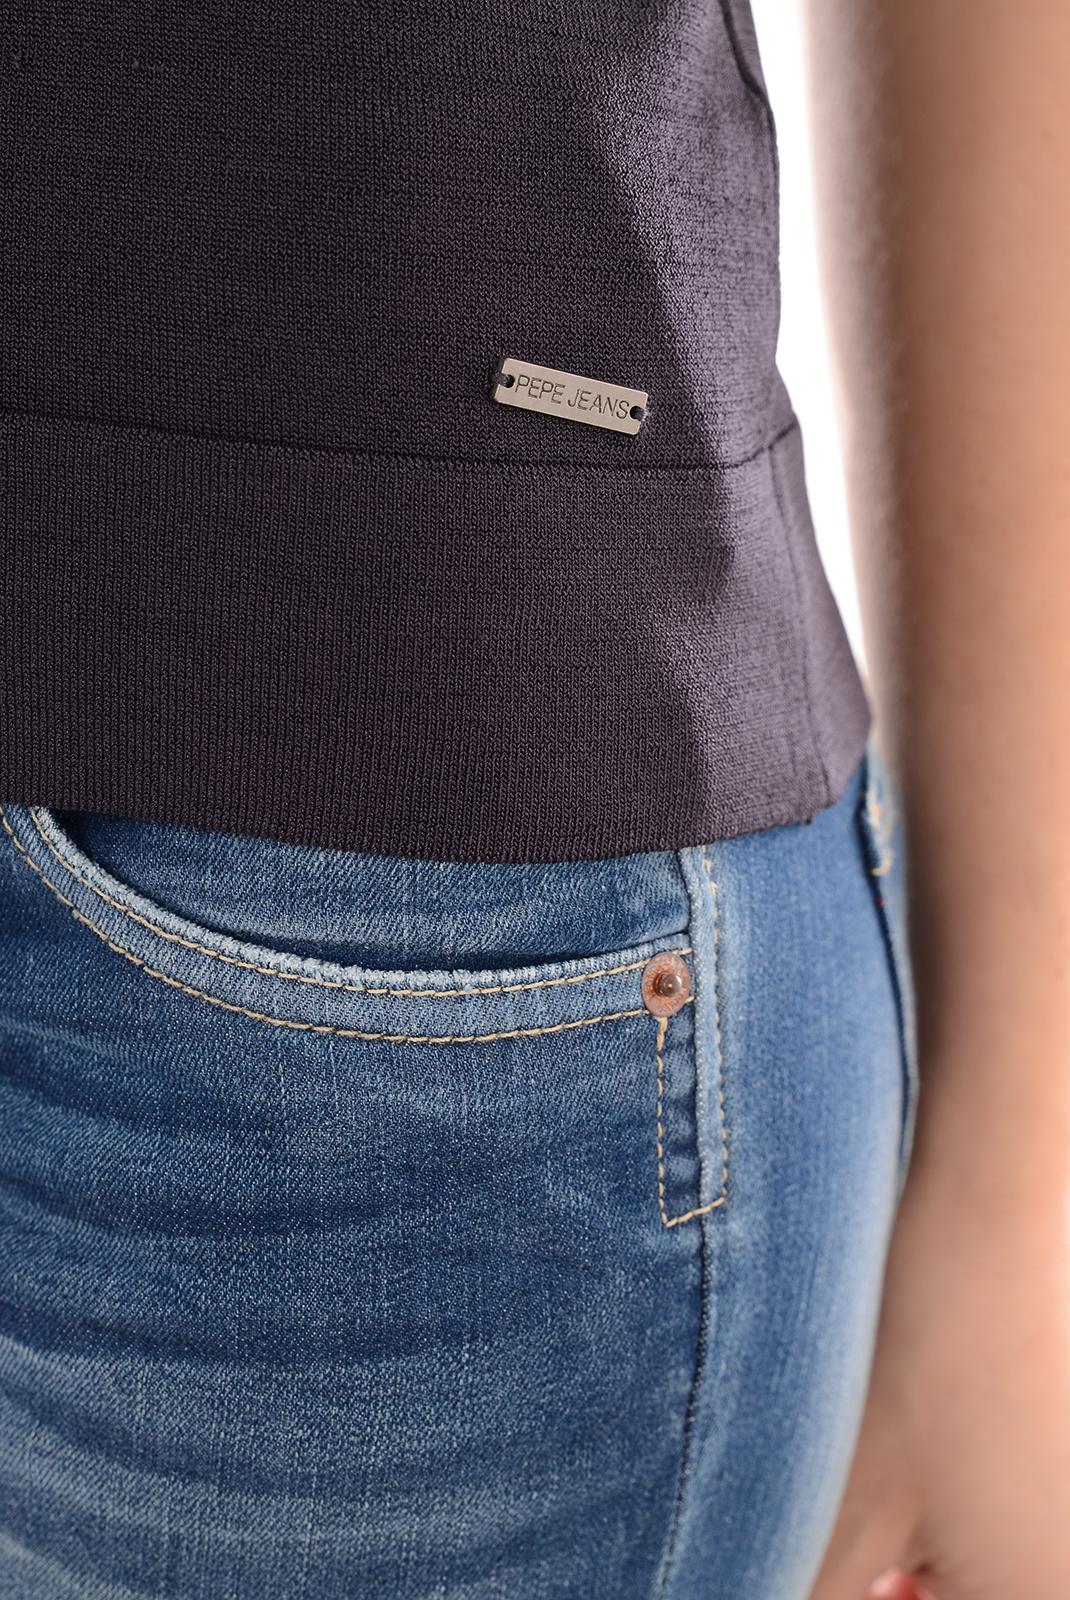 Tops & Tee shirts  Pepe jeans PL700905 LIRIO 493 PURPLE NOIR